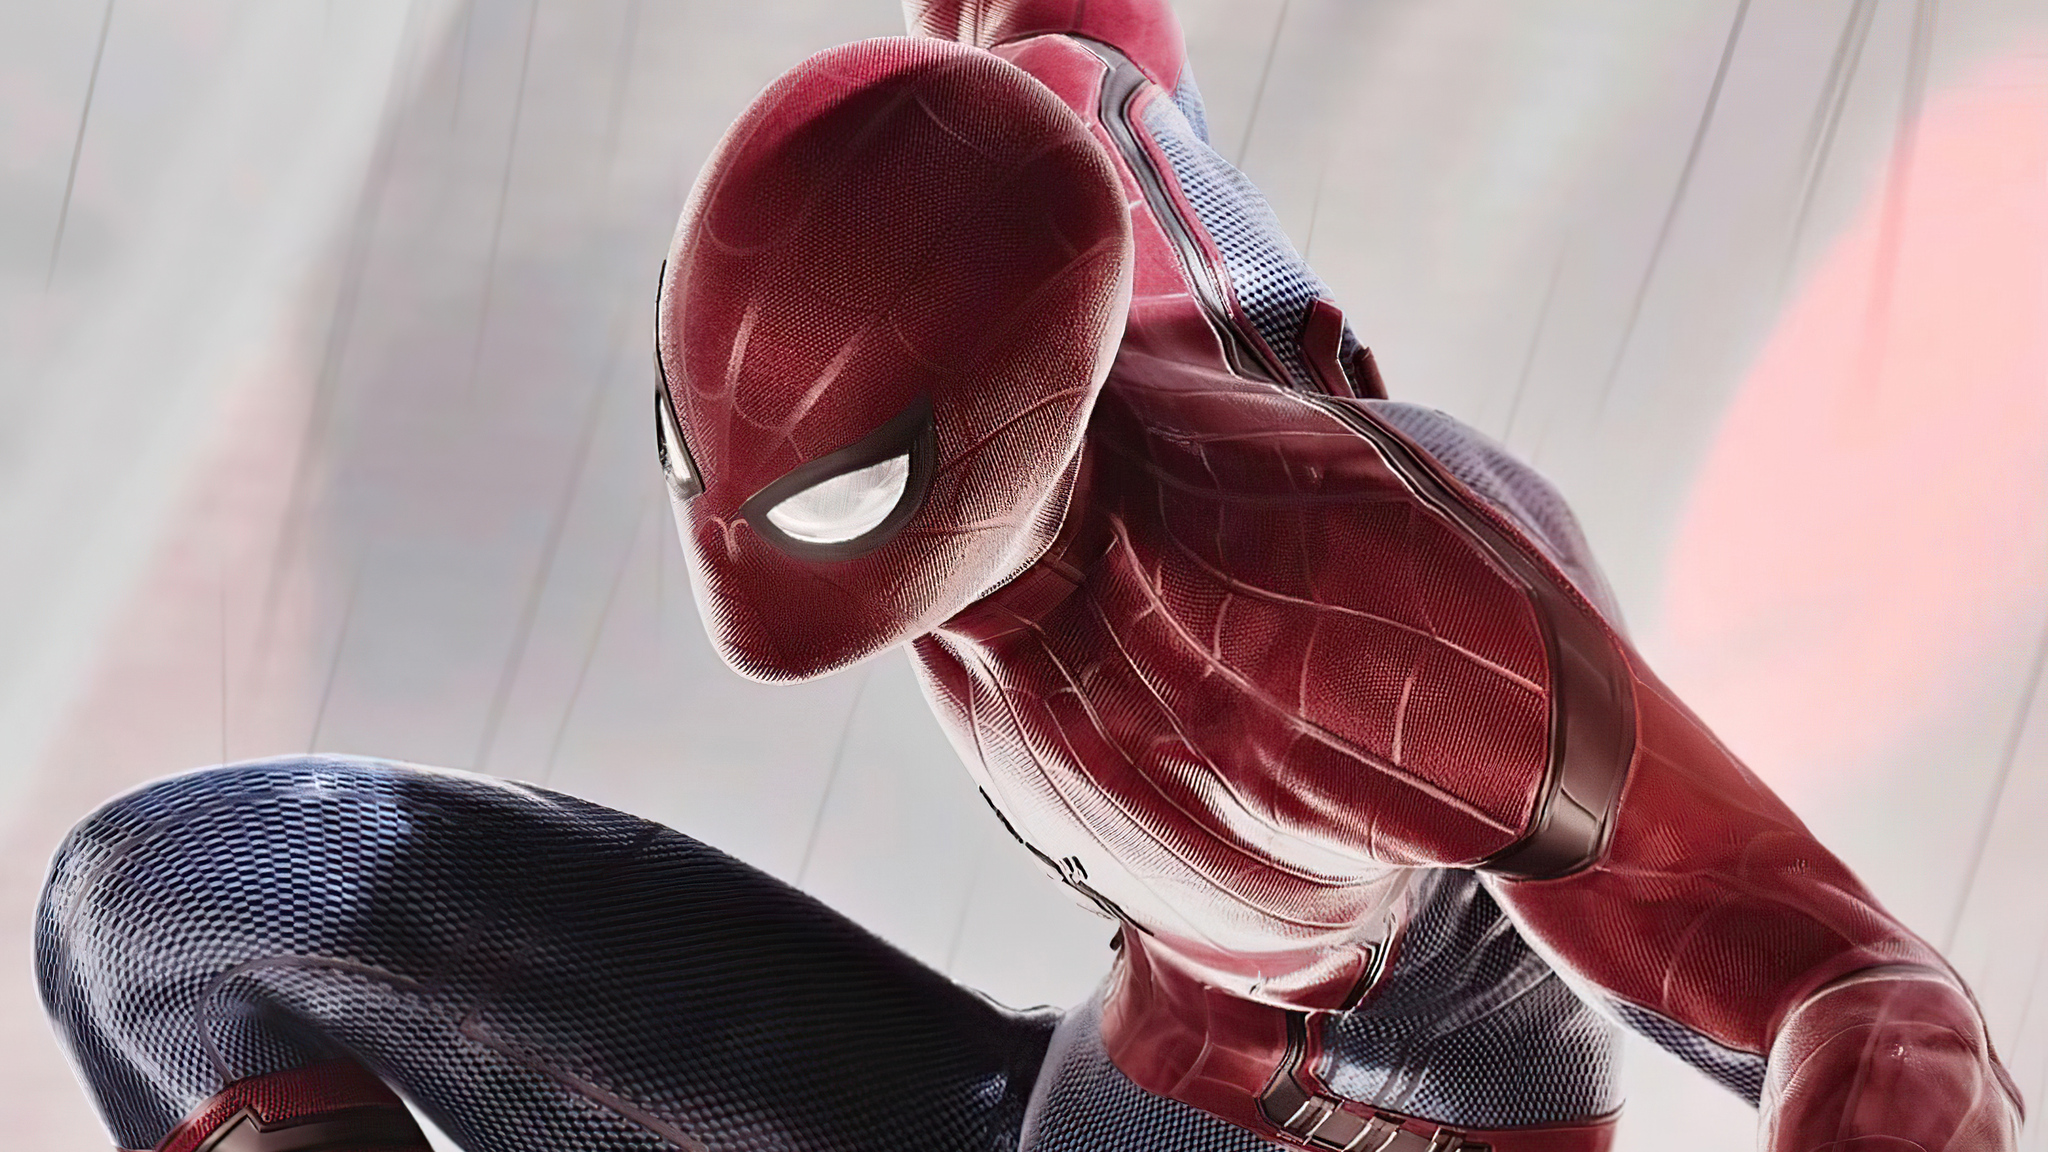 marvels-spiderman-game-4k-k9.jpg